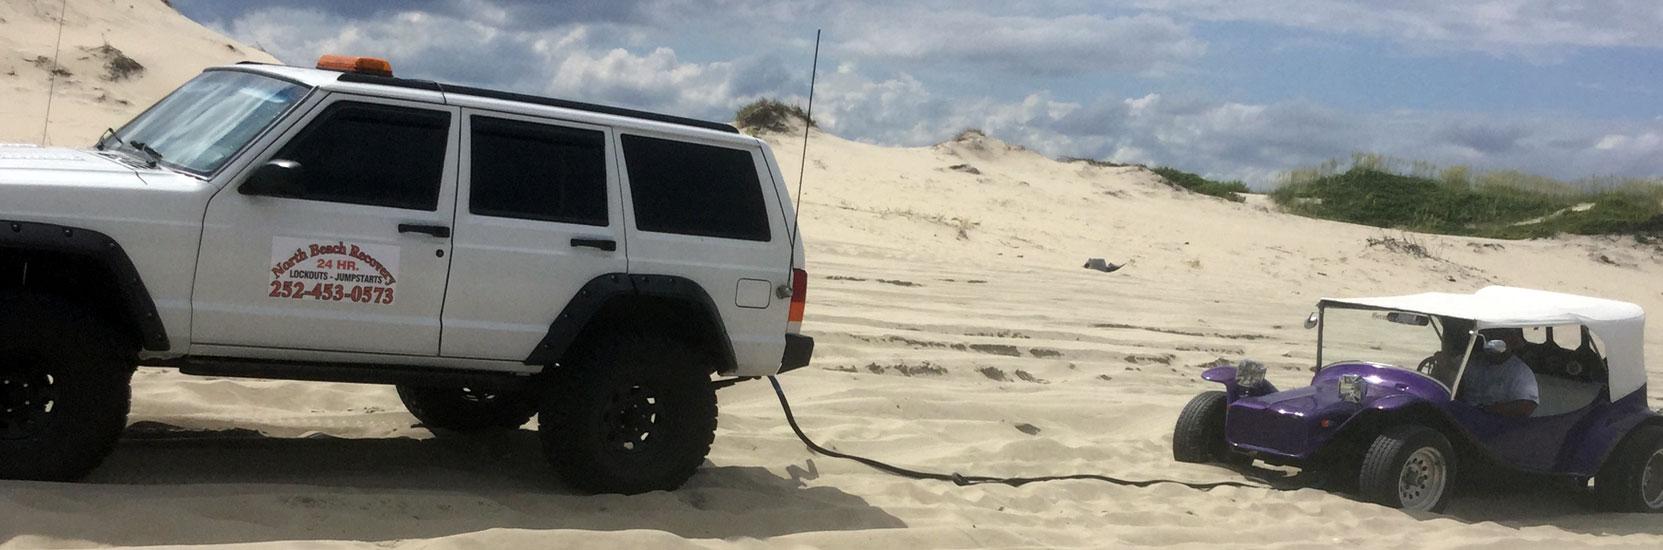 Carova Beach Dune Buggy Towing